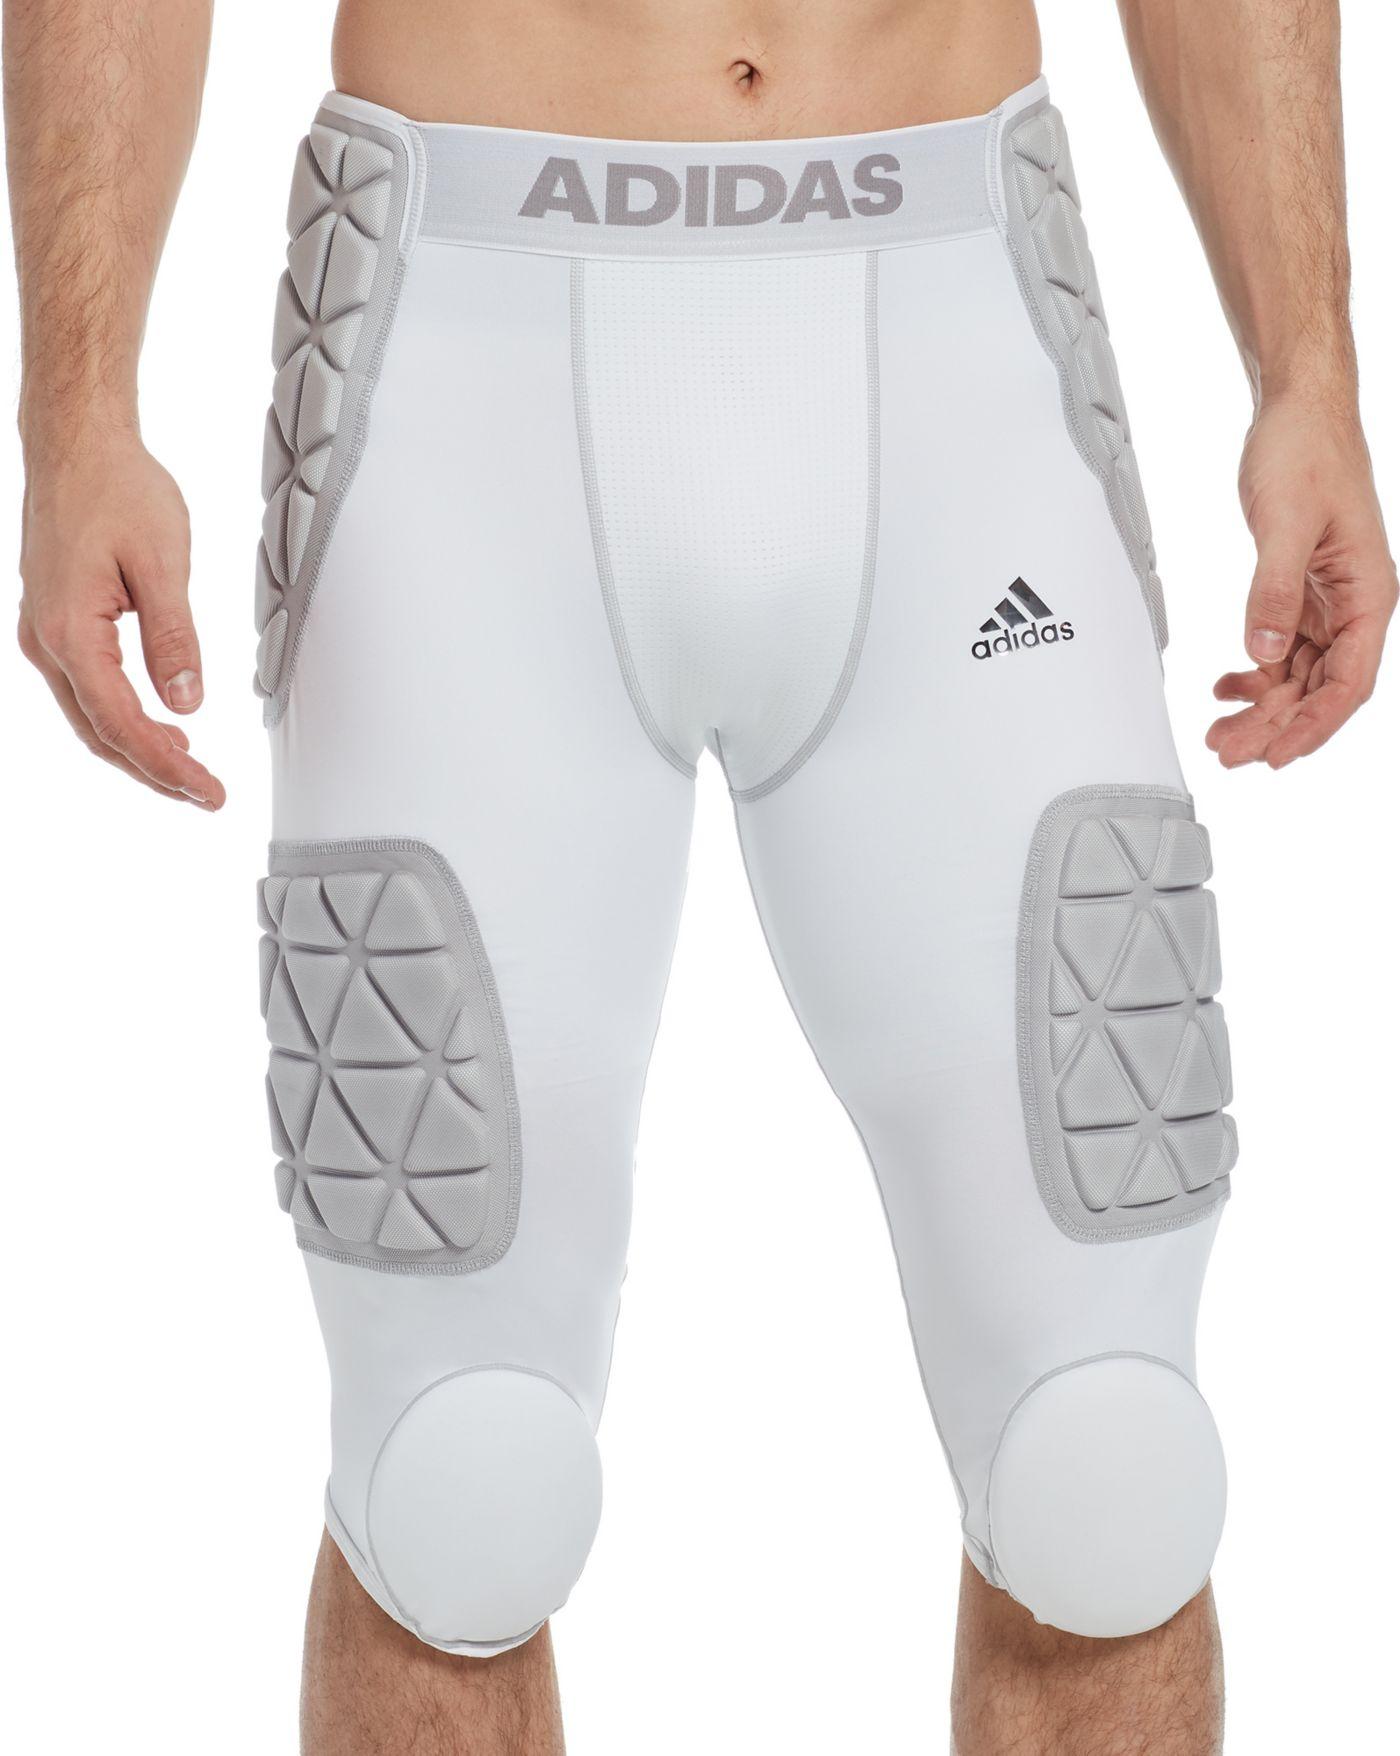 Adidas Adult Techfit 7 Pad Integrated Football Girdle